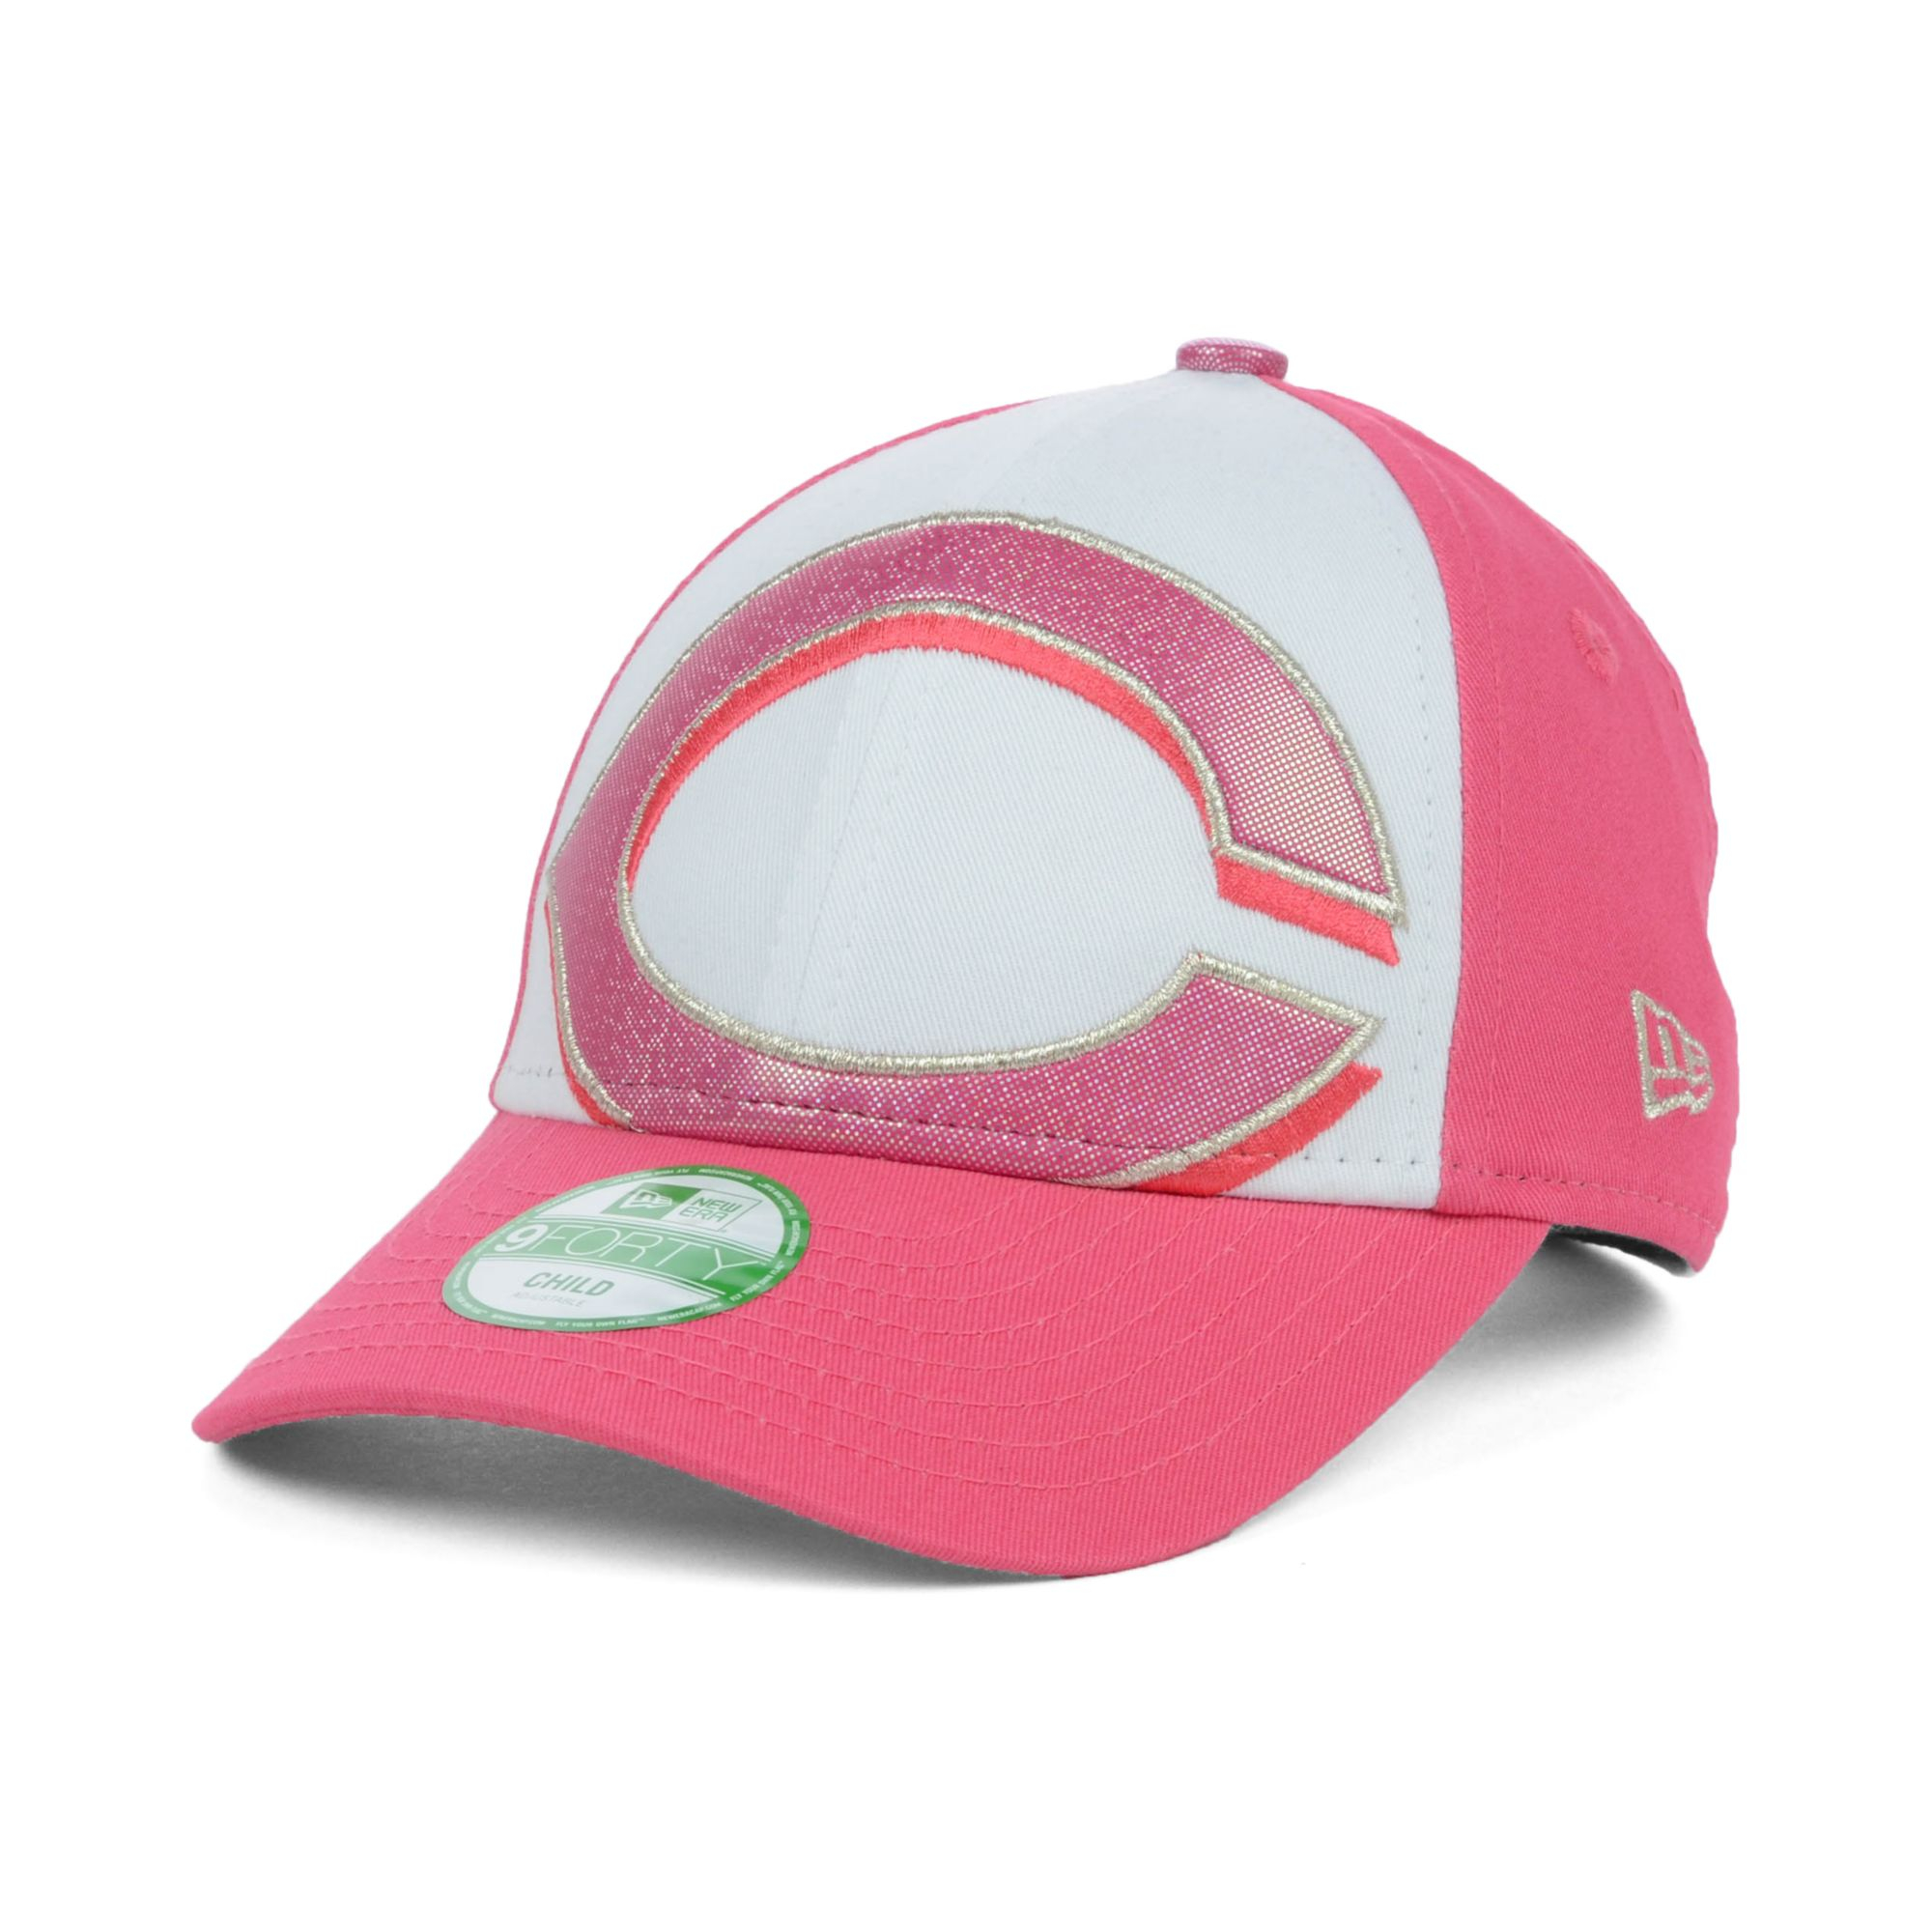 timeless design 0bbac 82cd0 ... promo code for lyst ktz kids cincinnati reds glitter filler 9forty cap  in pink 24dc0 6b72e